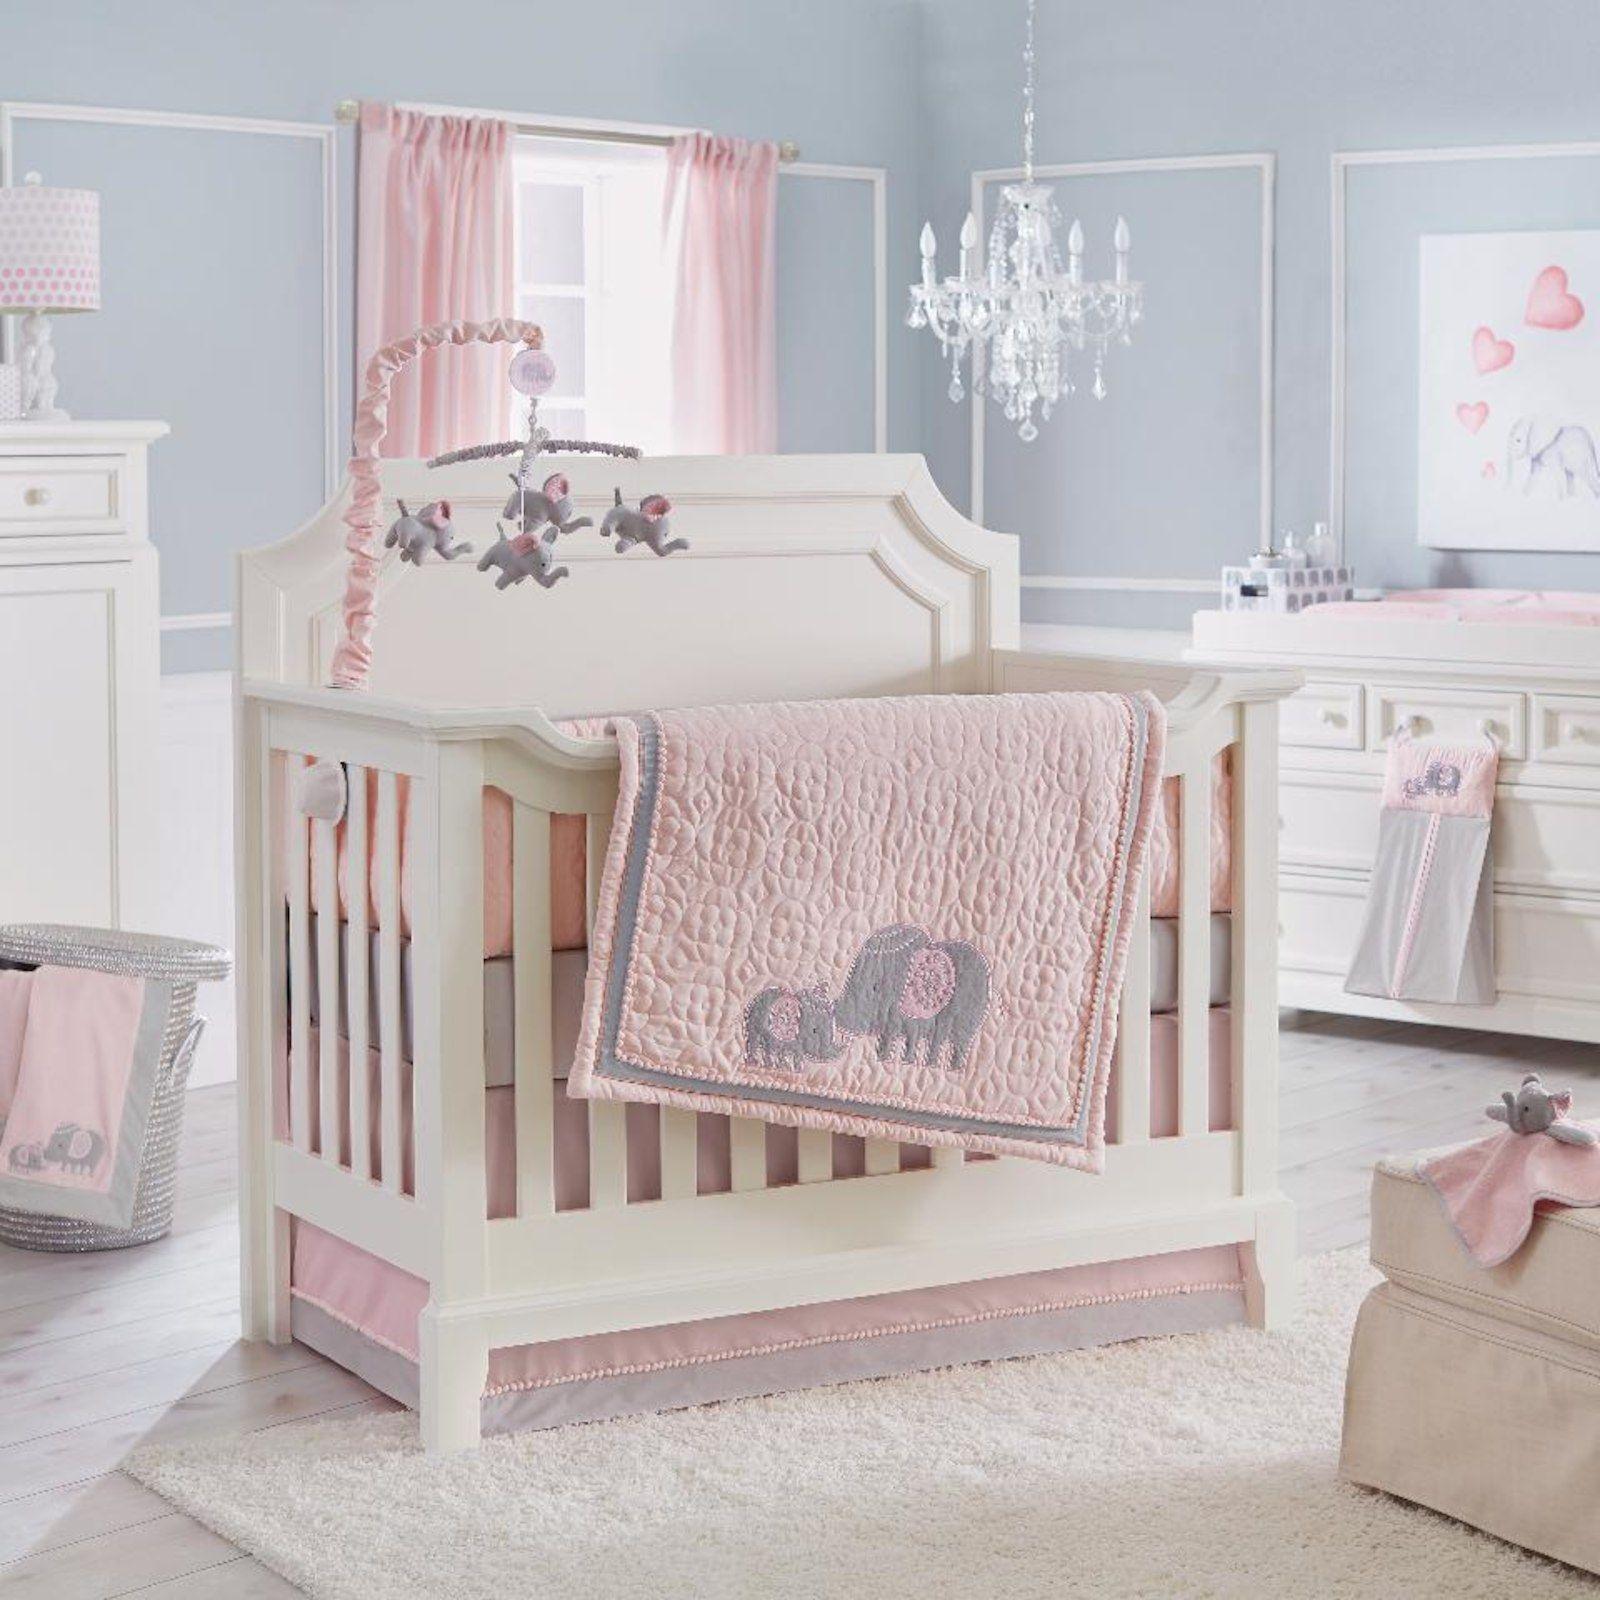 Koala Baby Elephant Dreams 4 Piece Crib Bedding Set